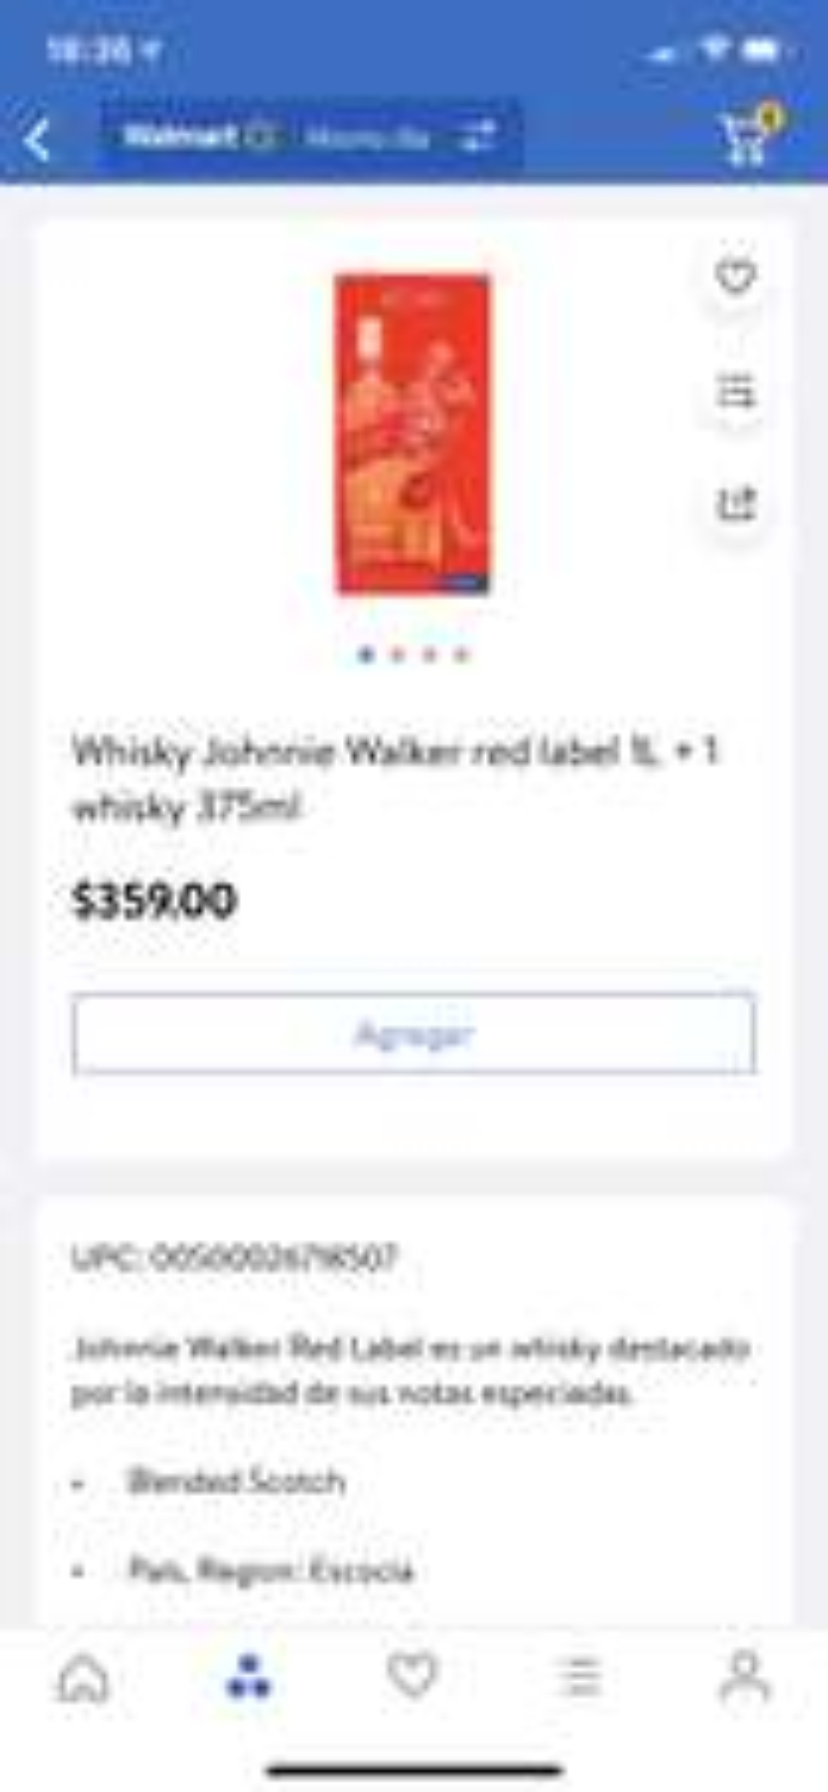 Walmart Super: Whisky Red label